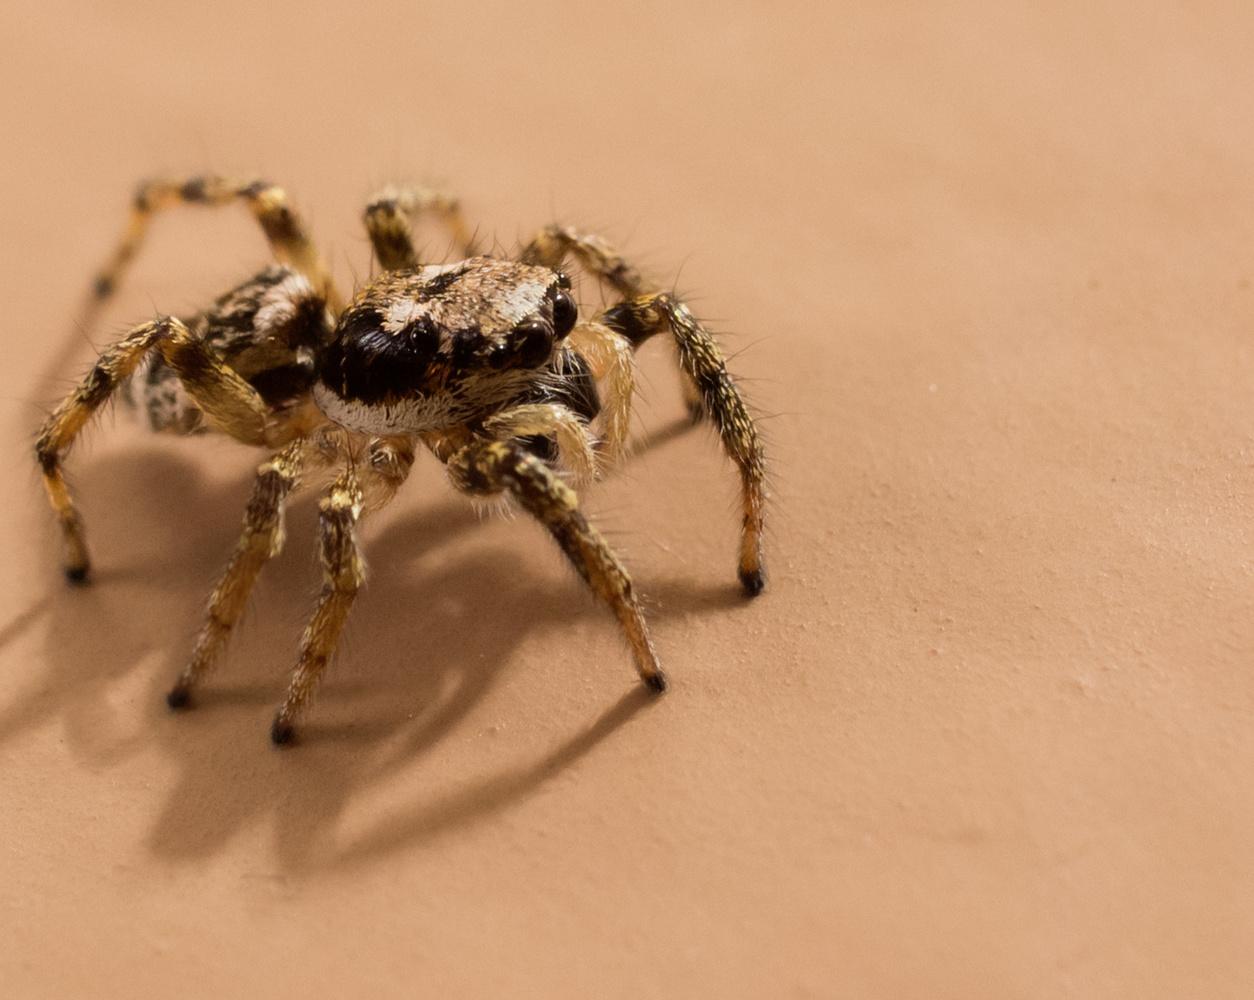 Jumping Spider by Robert Felker